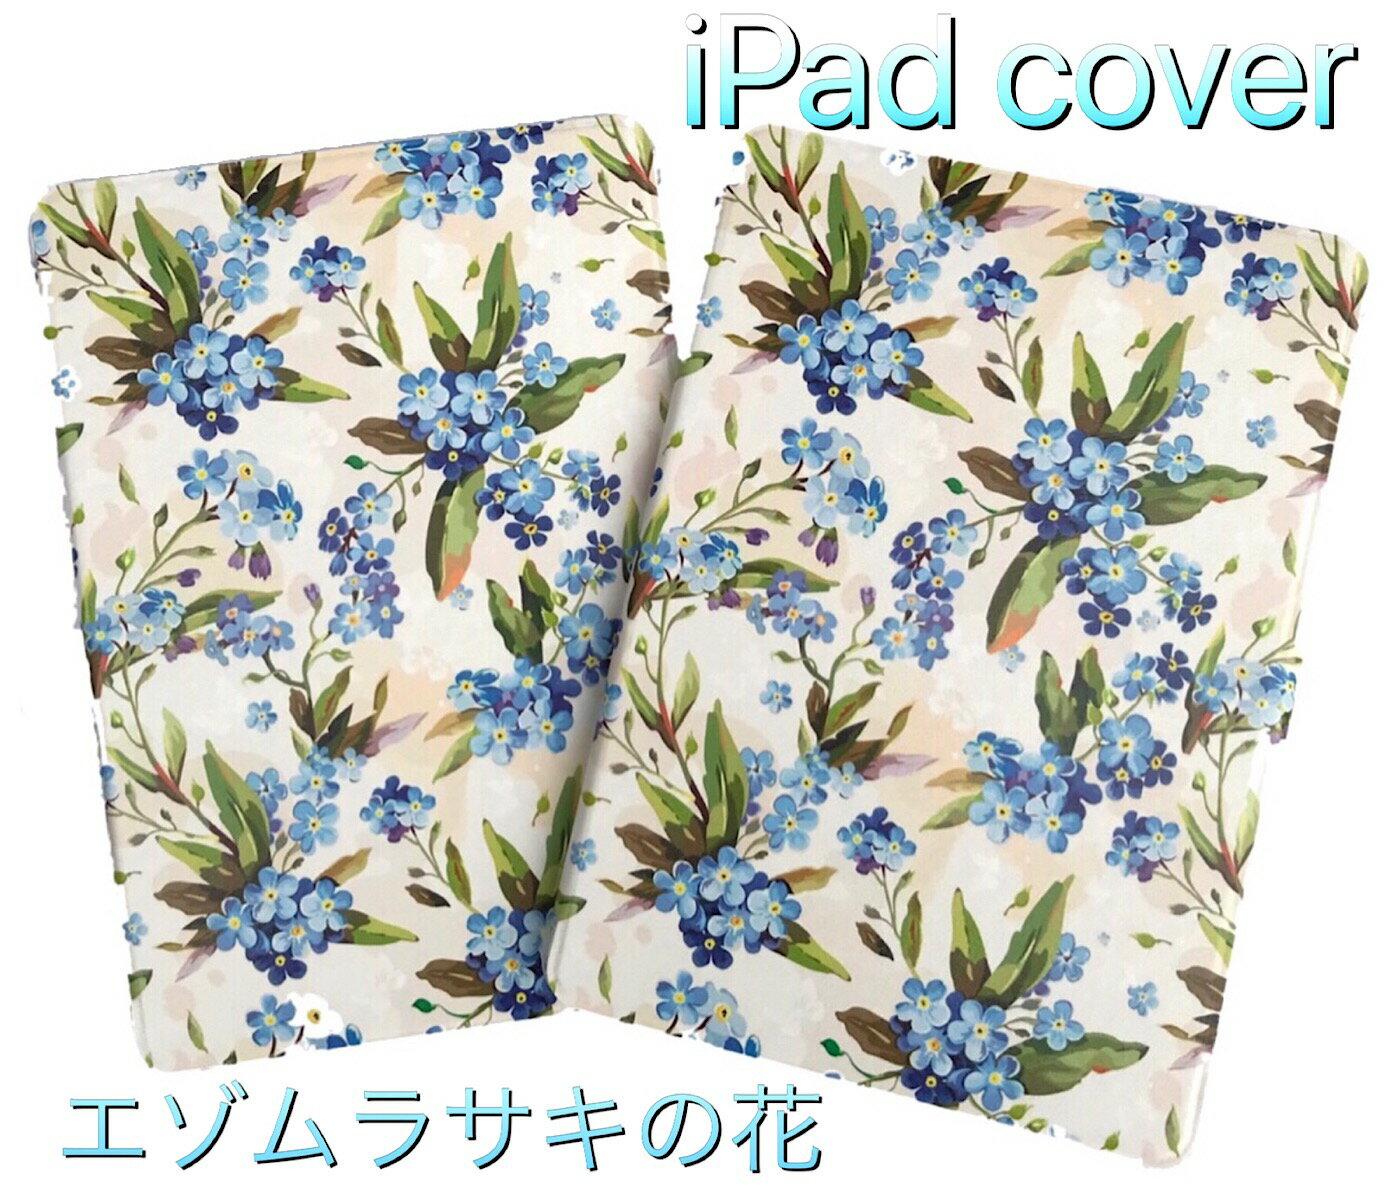 iPadケース エゾムラサキの花 iPadカバー mini Air iPad5 2017 iPad6 2018 Pro9.7 2019年 Air3 10.5 アイパッド タブレット 花柄 可愛い おしゃれ